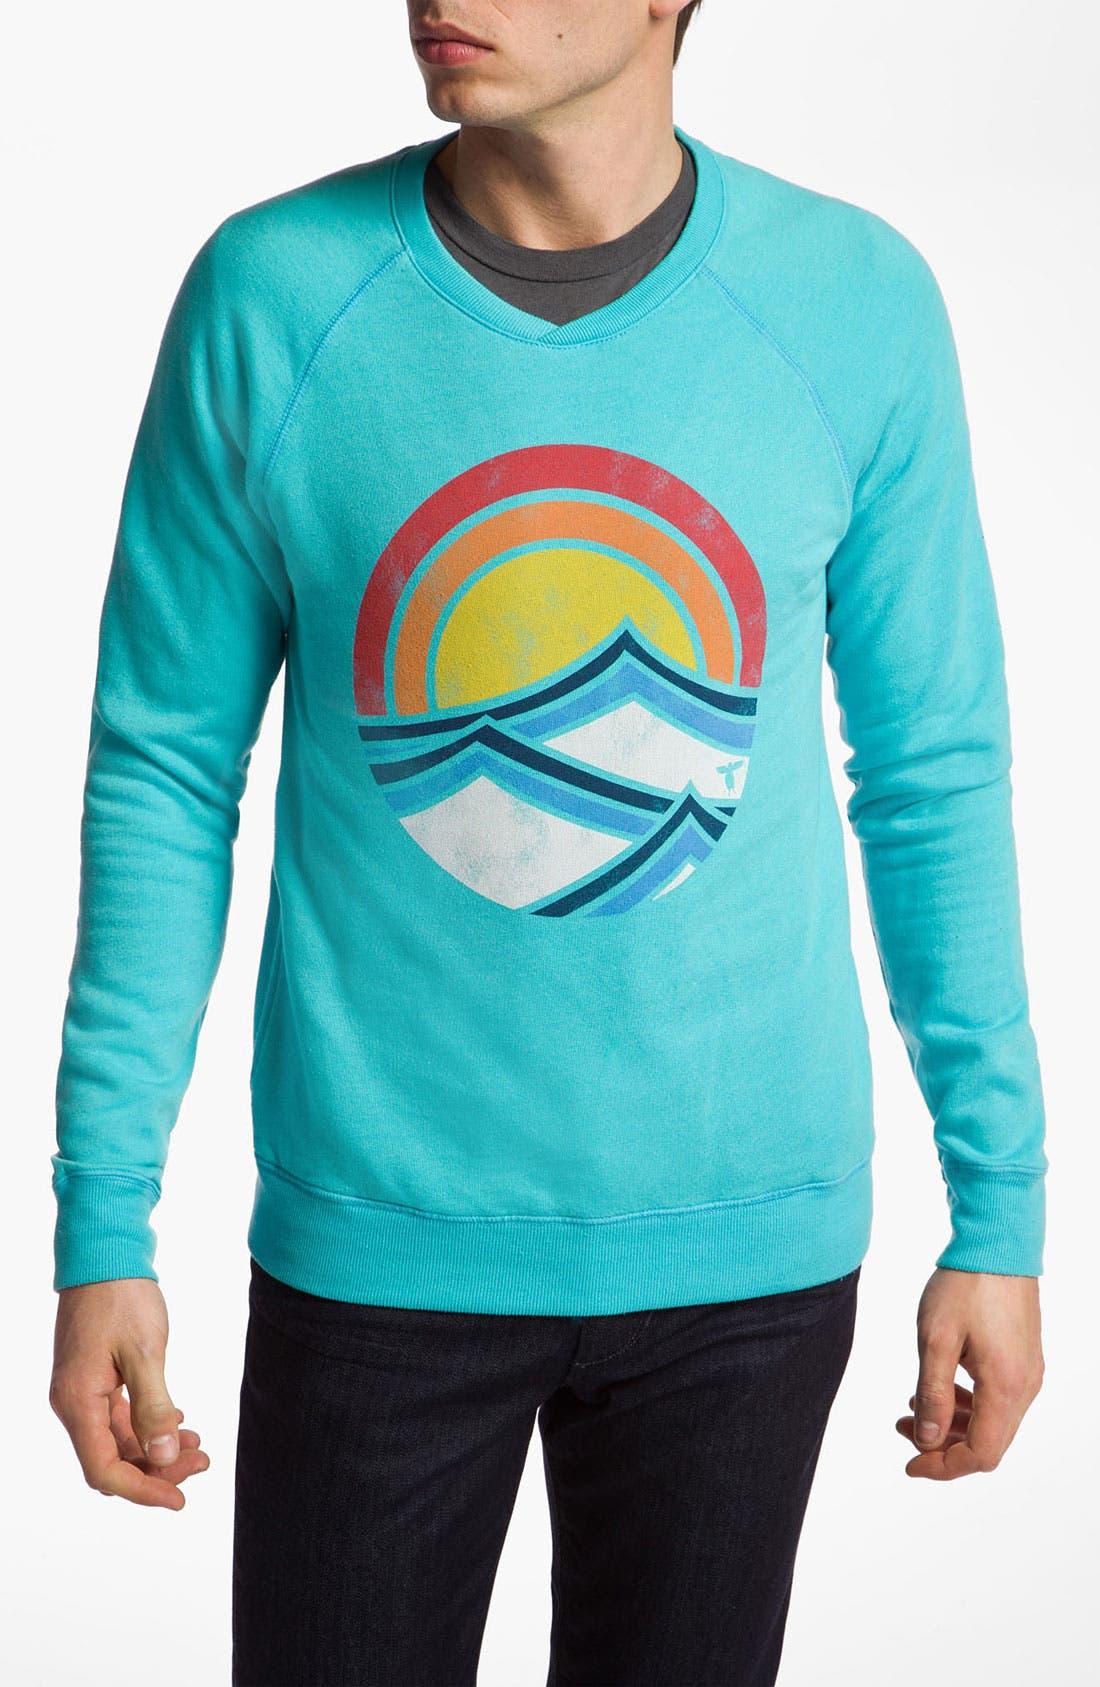 Main Image - Topo Ranch 'Swell Rise' Crewneck Sweatshirt